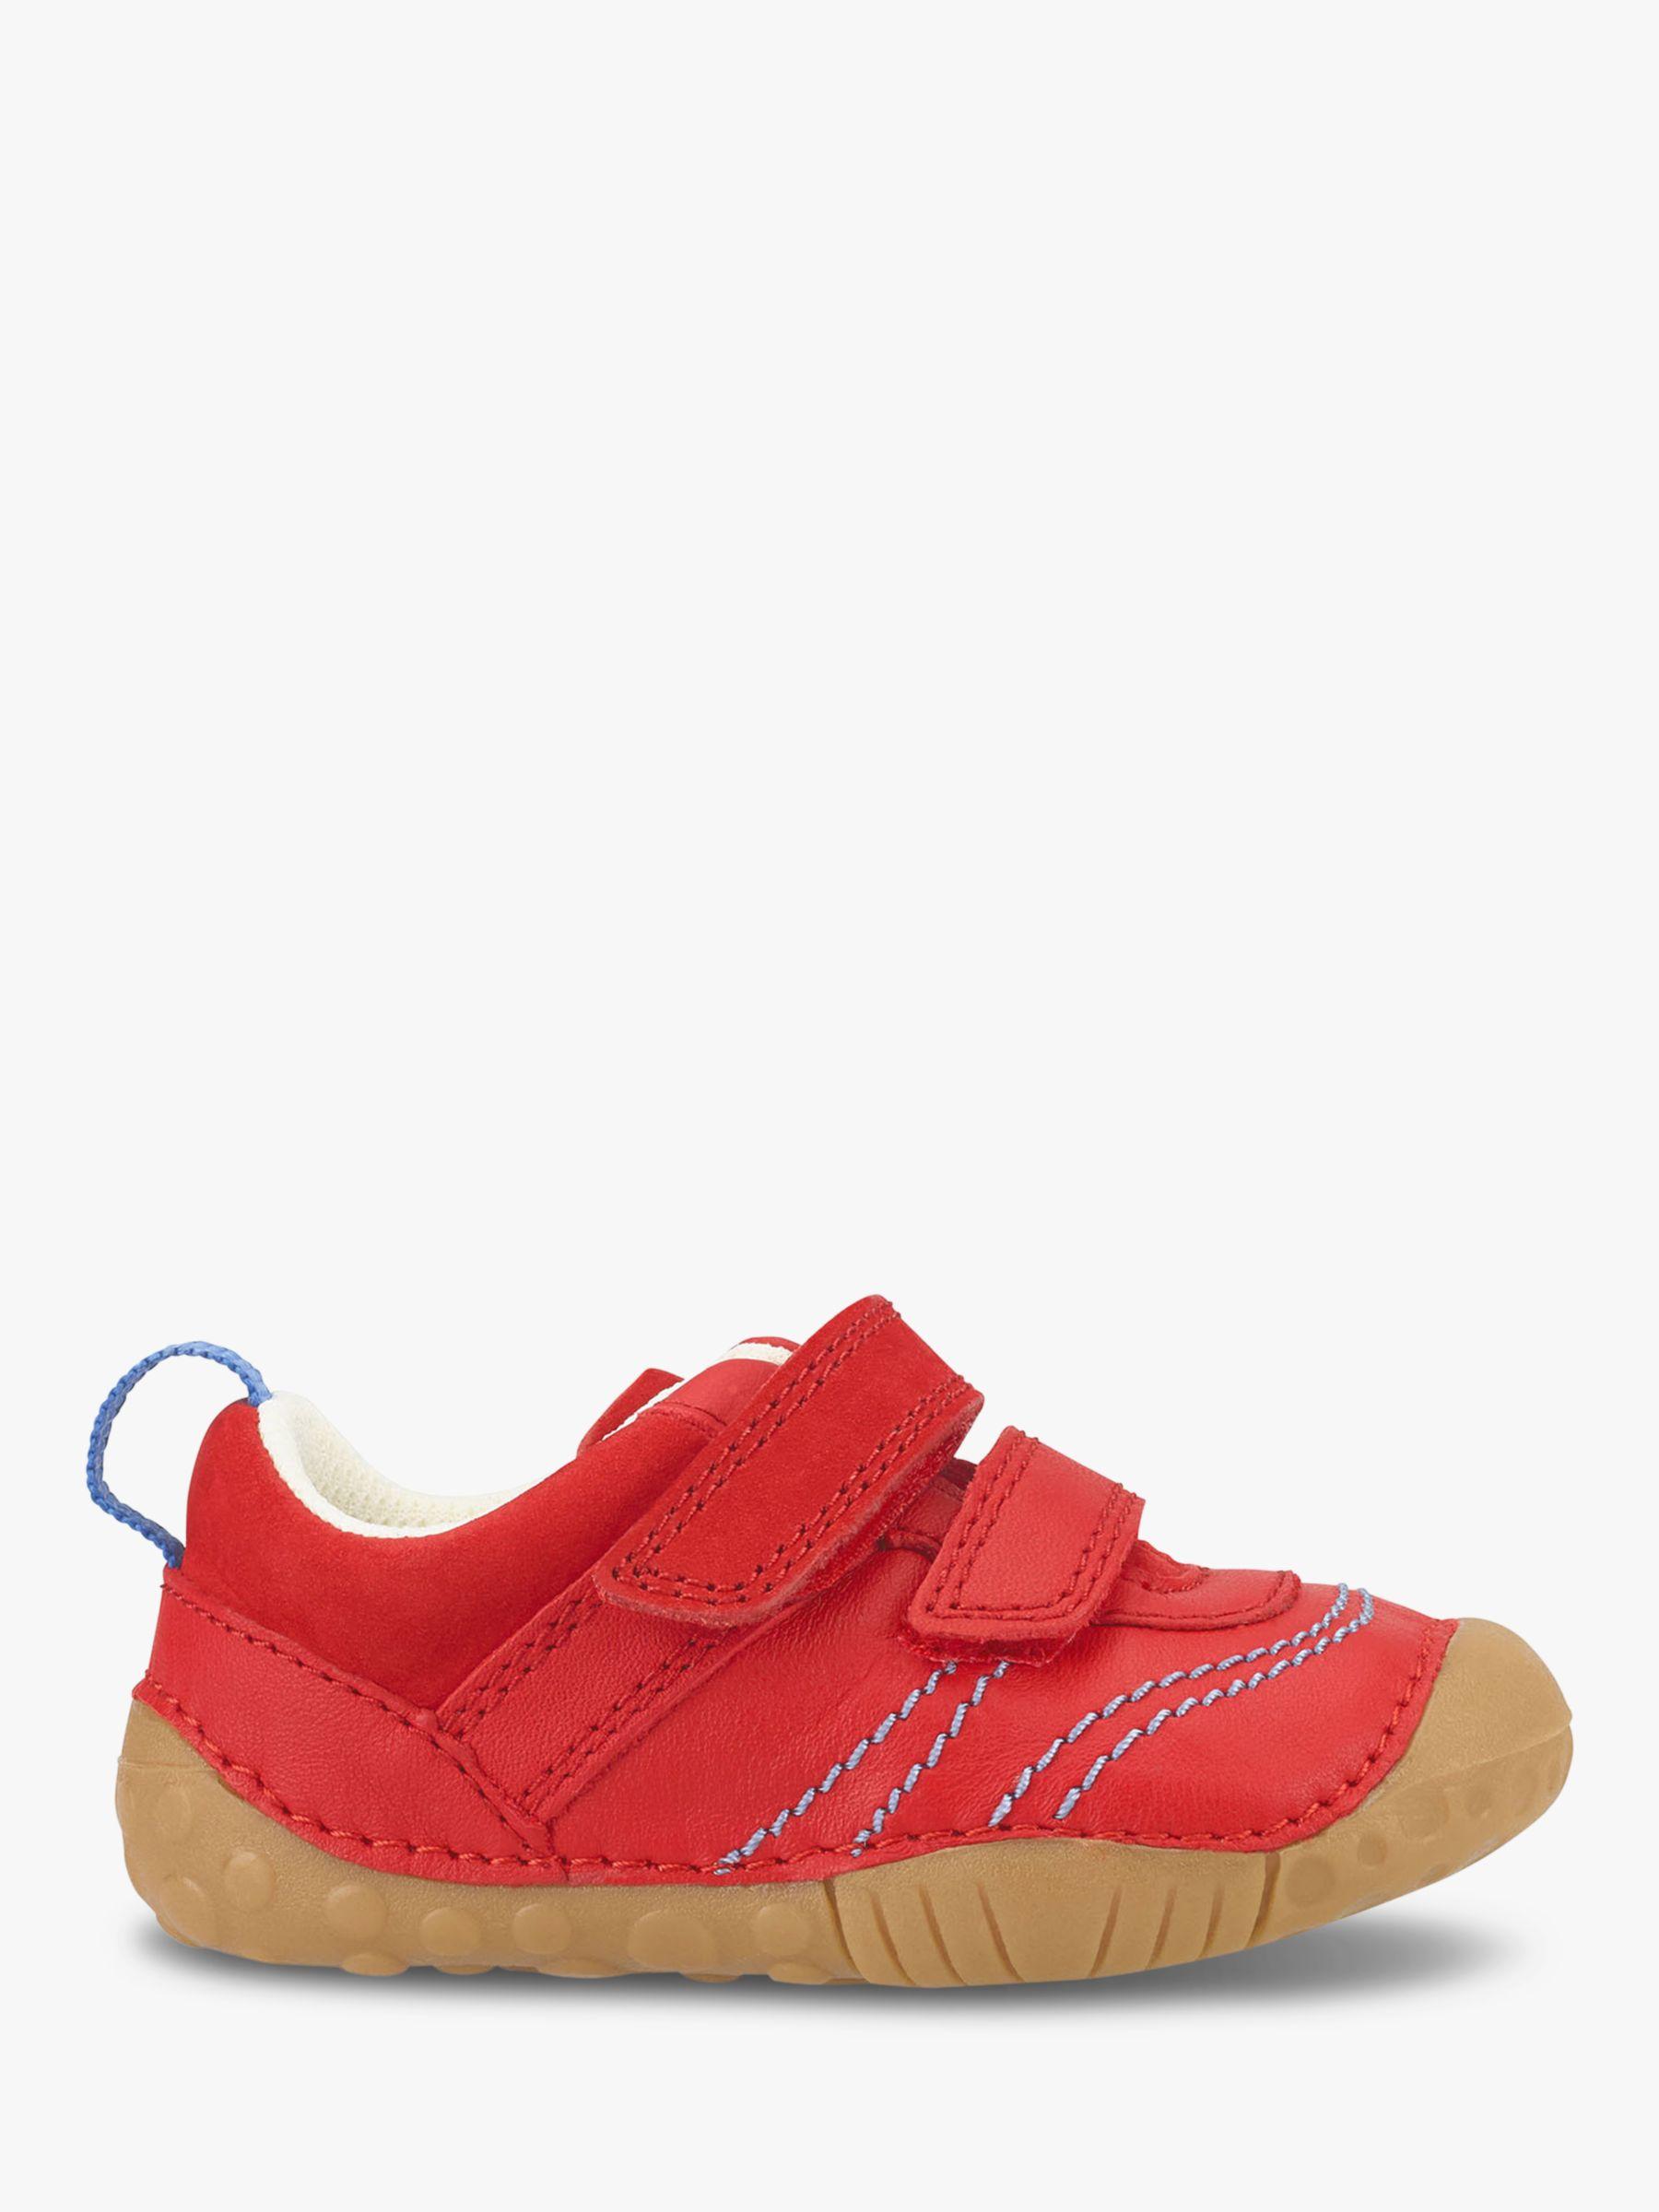 Start-Rite Start-rite Children's Leo T-Bar Buckle Pre-Walker Shoes, Red